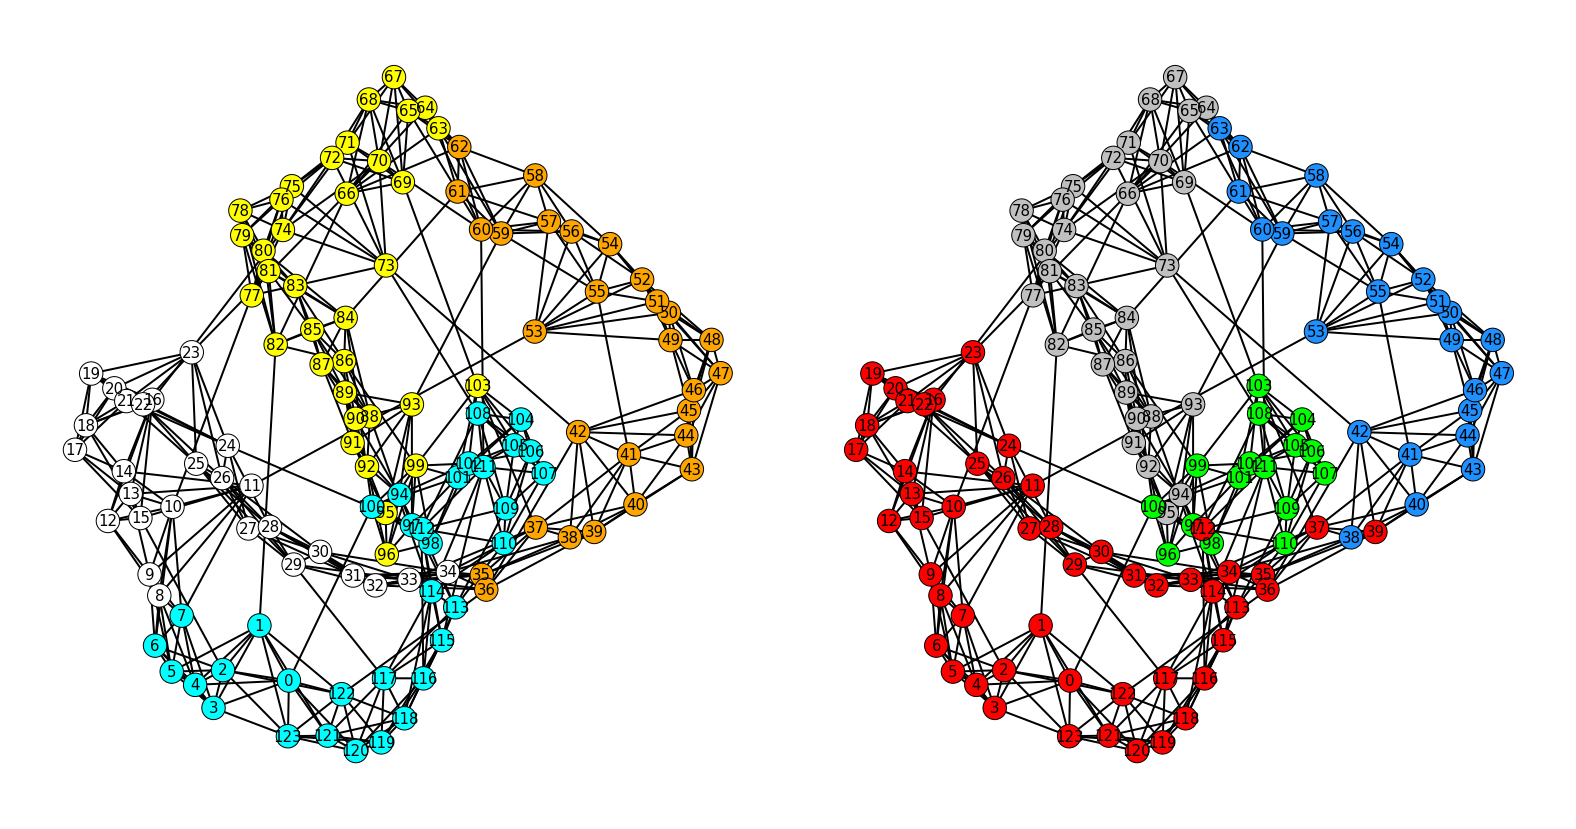 Girvan-Newman vs Spectral clustering –image